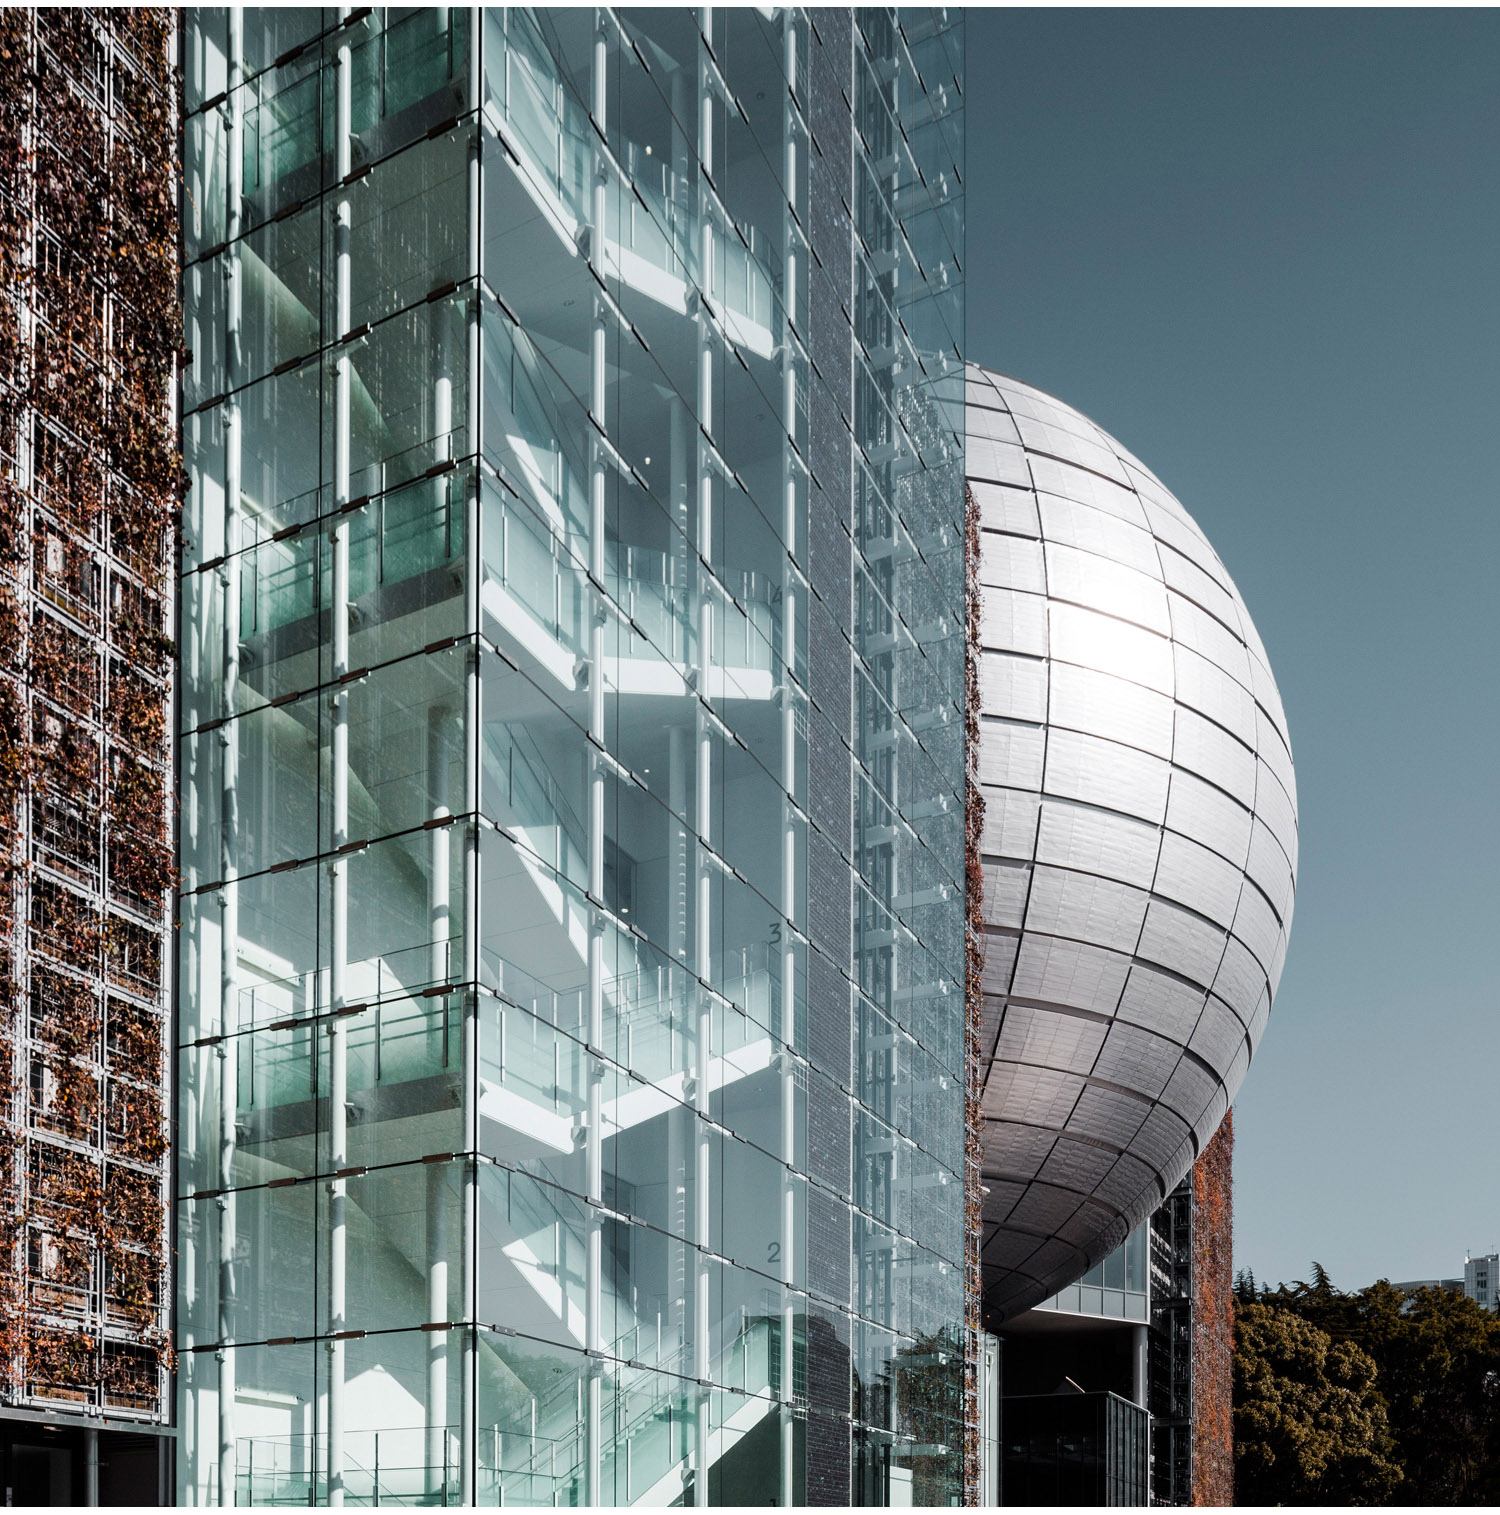 005-Japan-Architecture.jpg